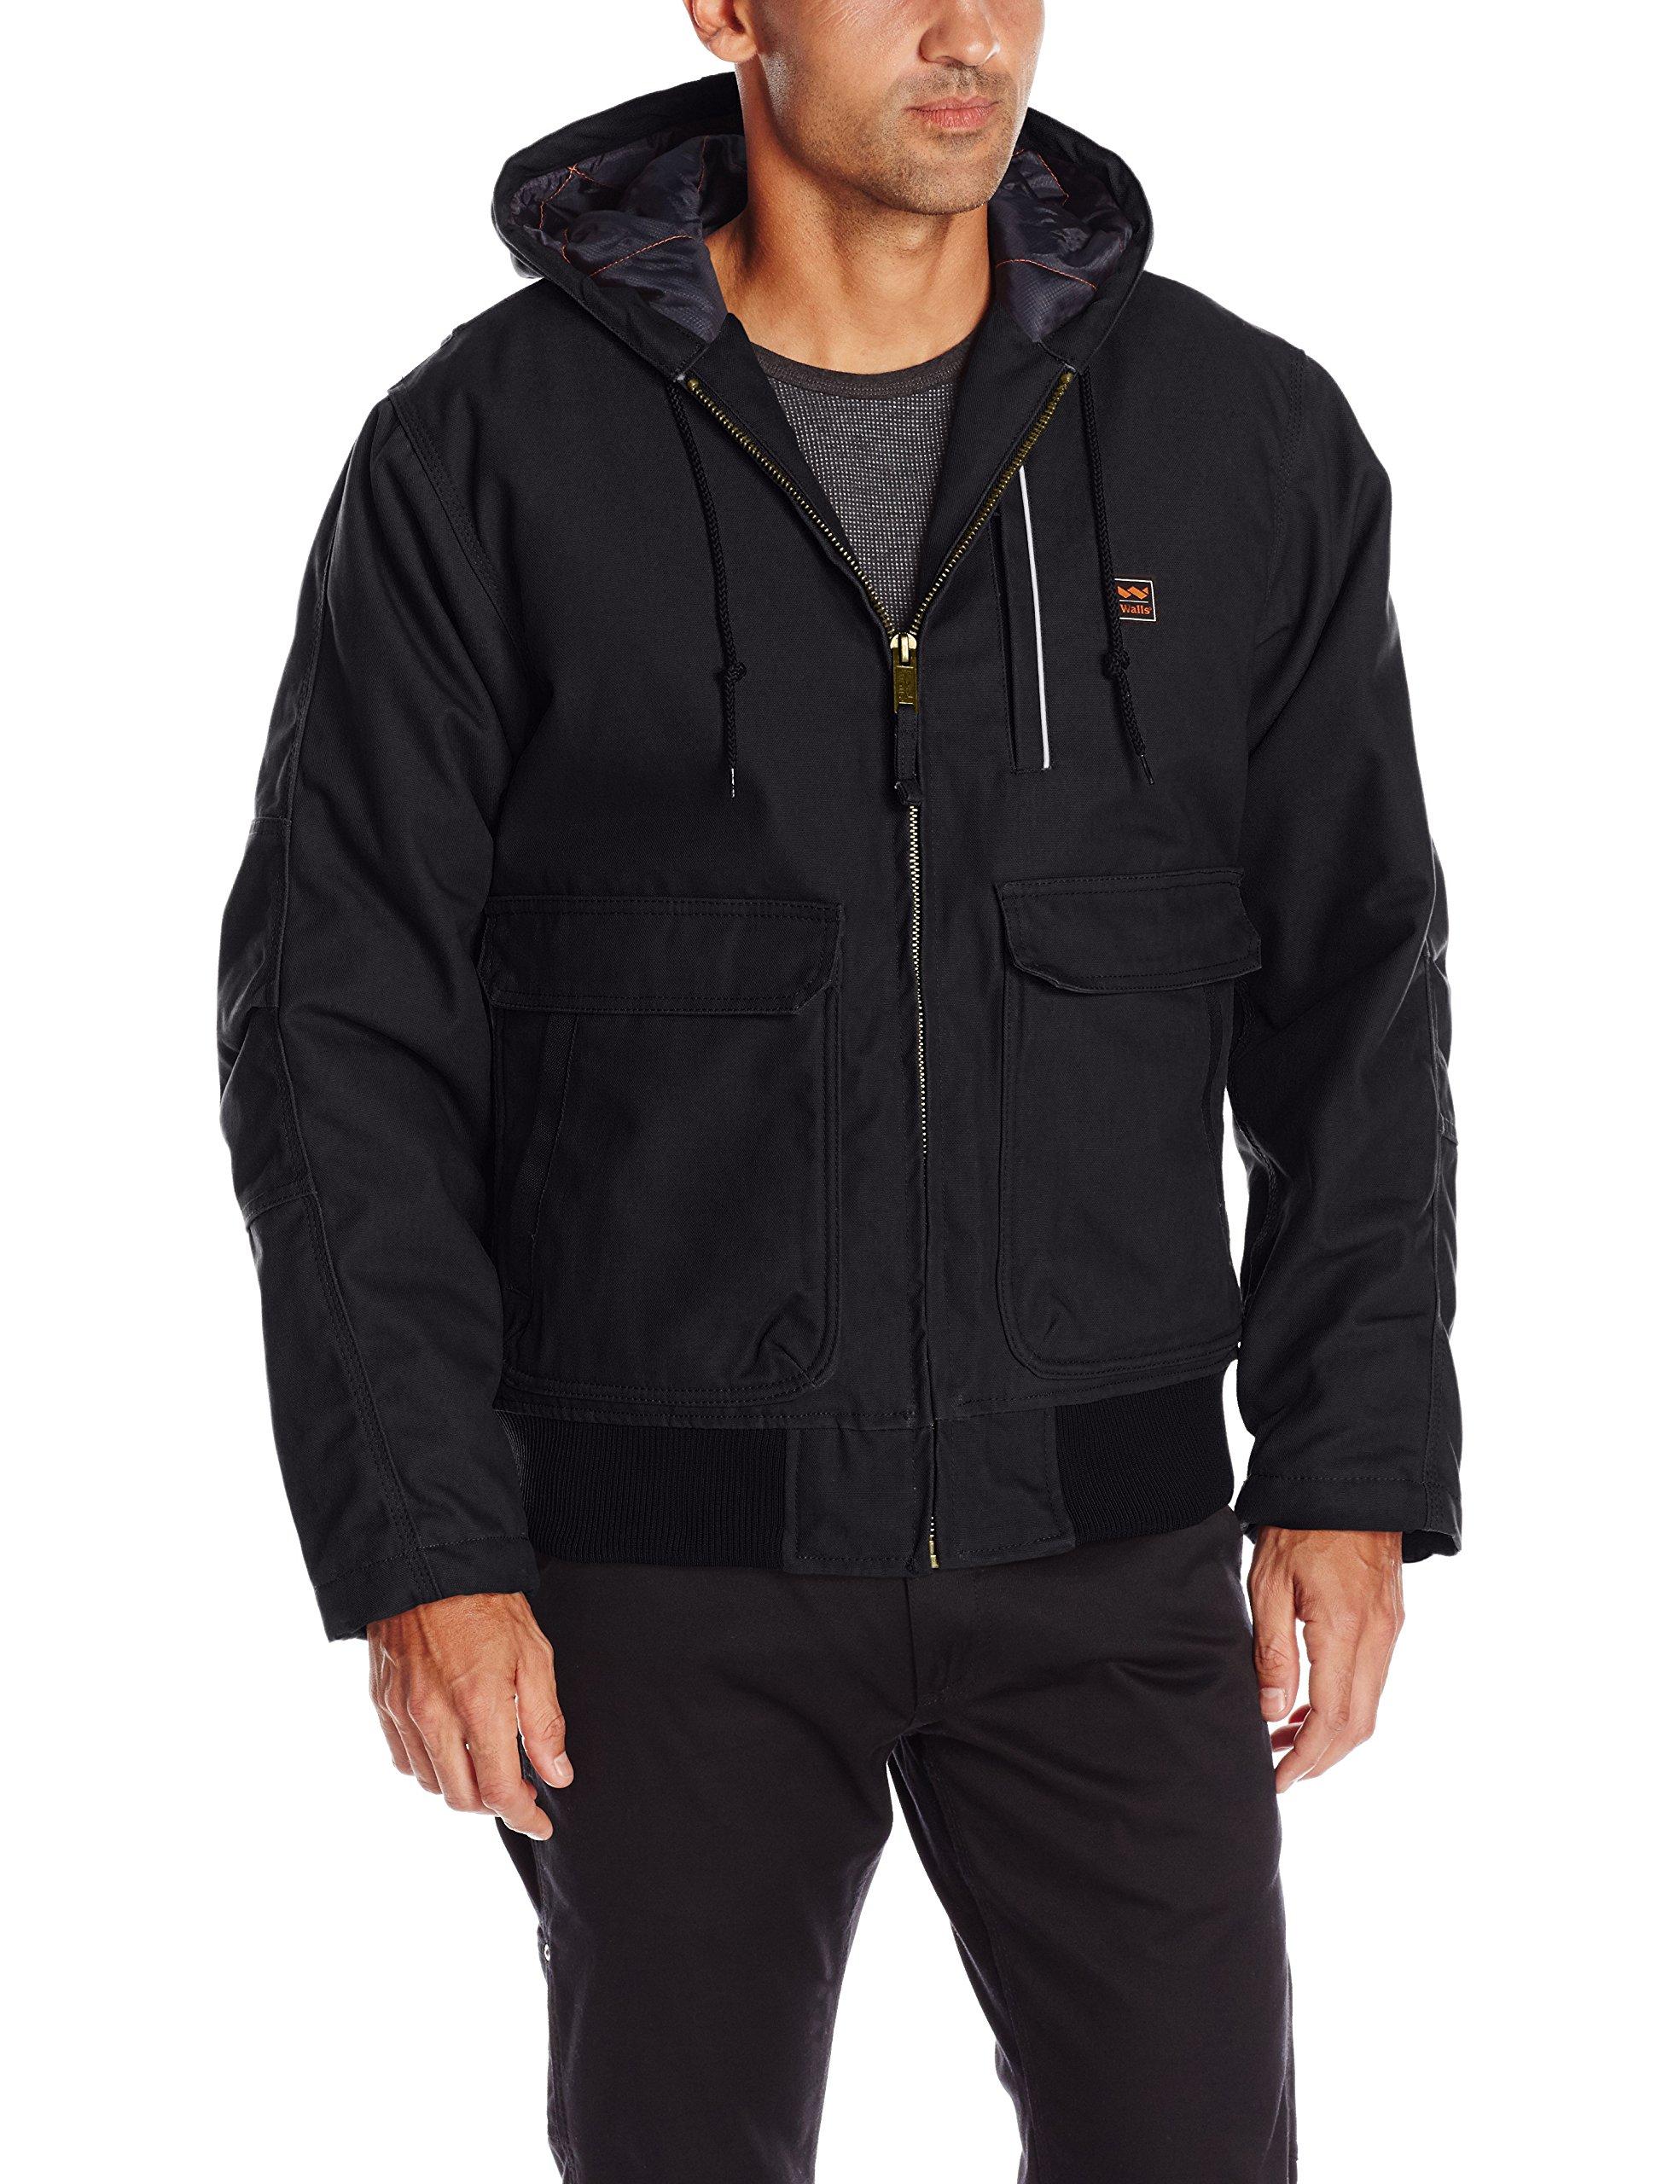 Walls Men's Lancaster Blizzard Pruf Hooded Jacket, Midnight Black, X-Large